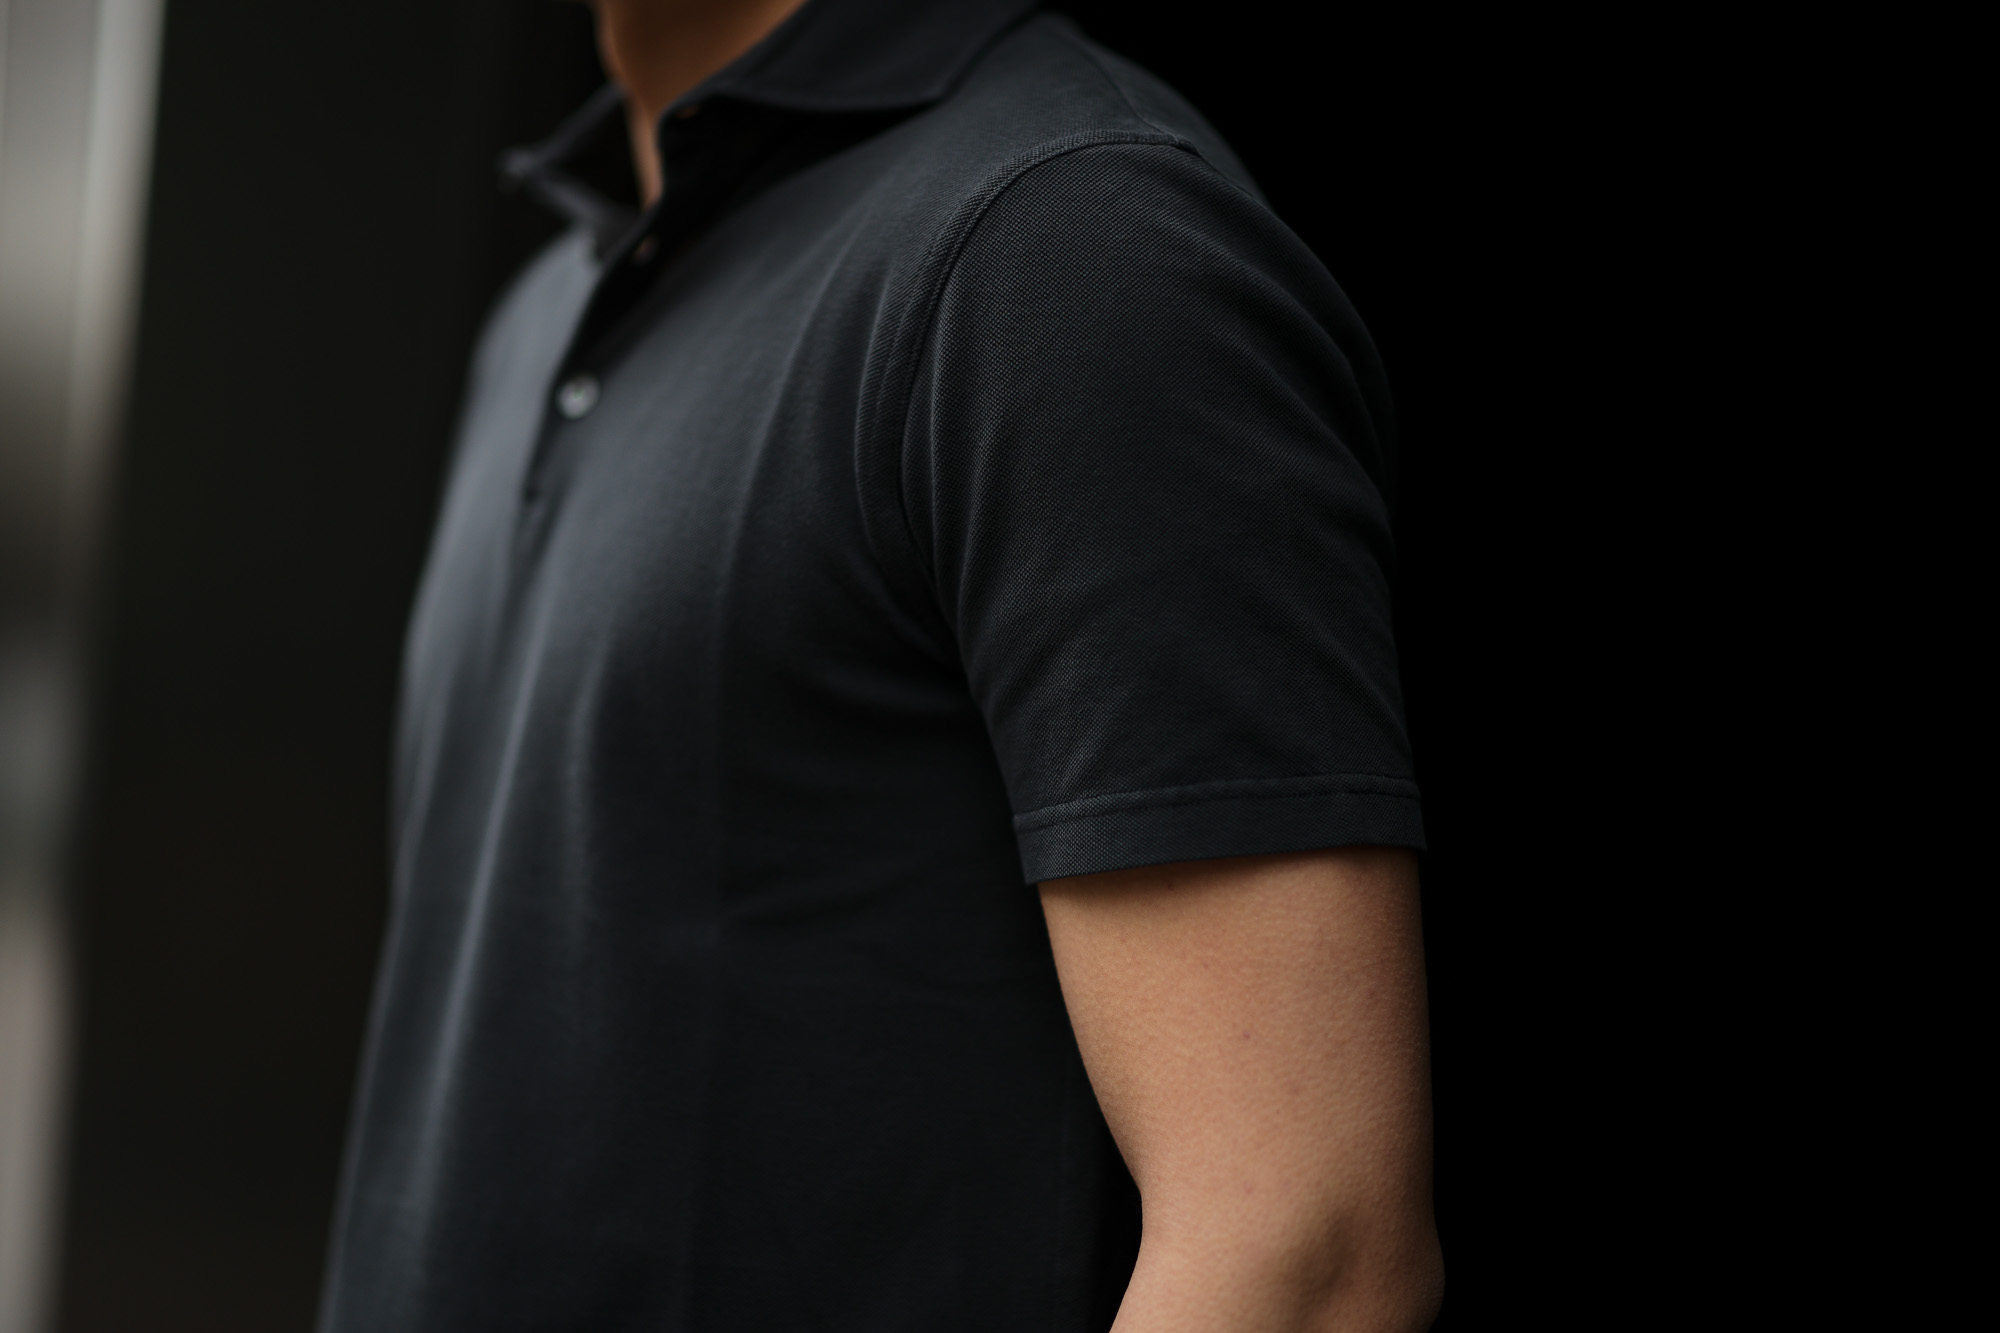 FEDELI (フェデーリ) Piquet Polo Shirt (ピケ ポロシャツ) カノコ ポロシャツ BLACK(ブラック・36) made in italy (イタリア製) 2019 春夏新作 愛知 名古屋 altoediritto アルトエデリット